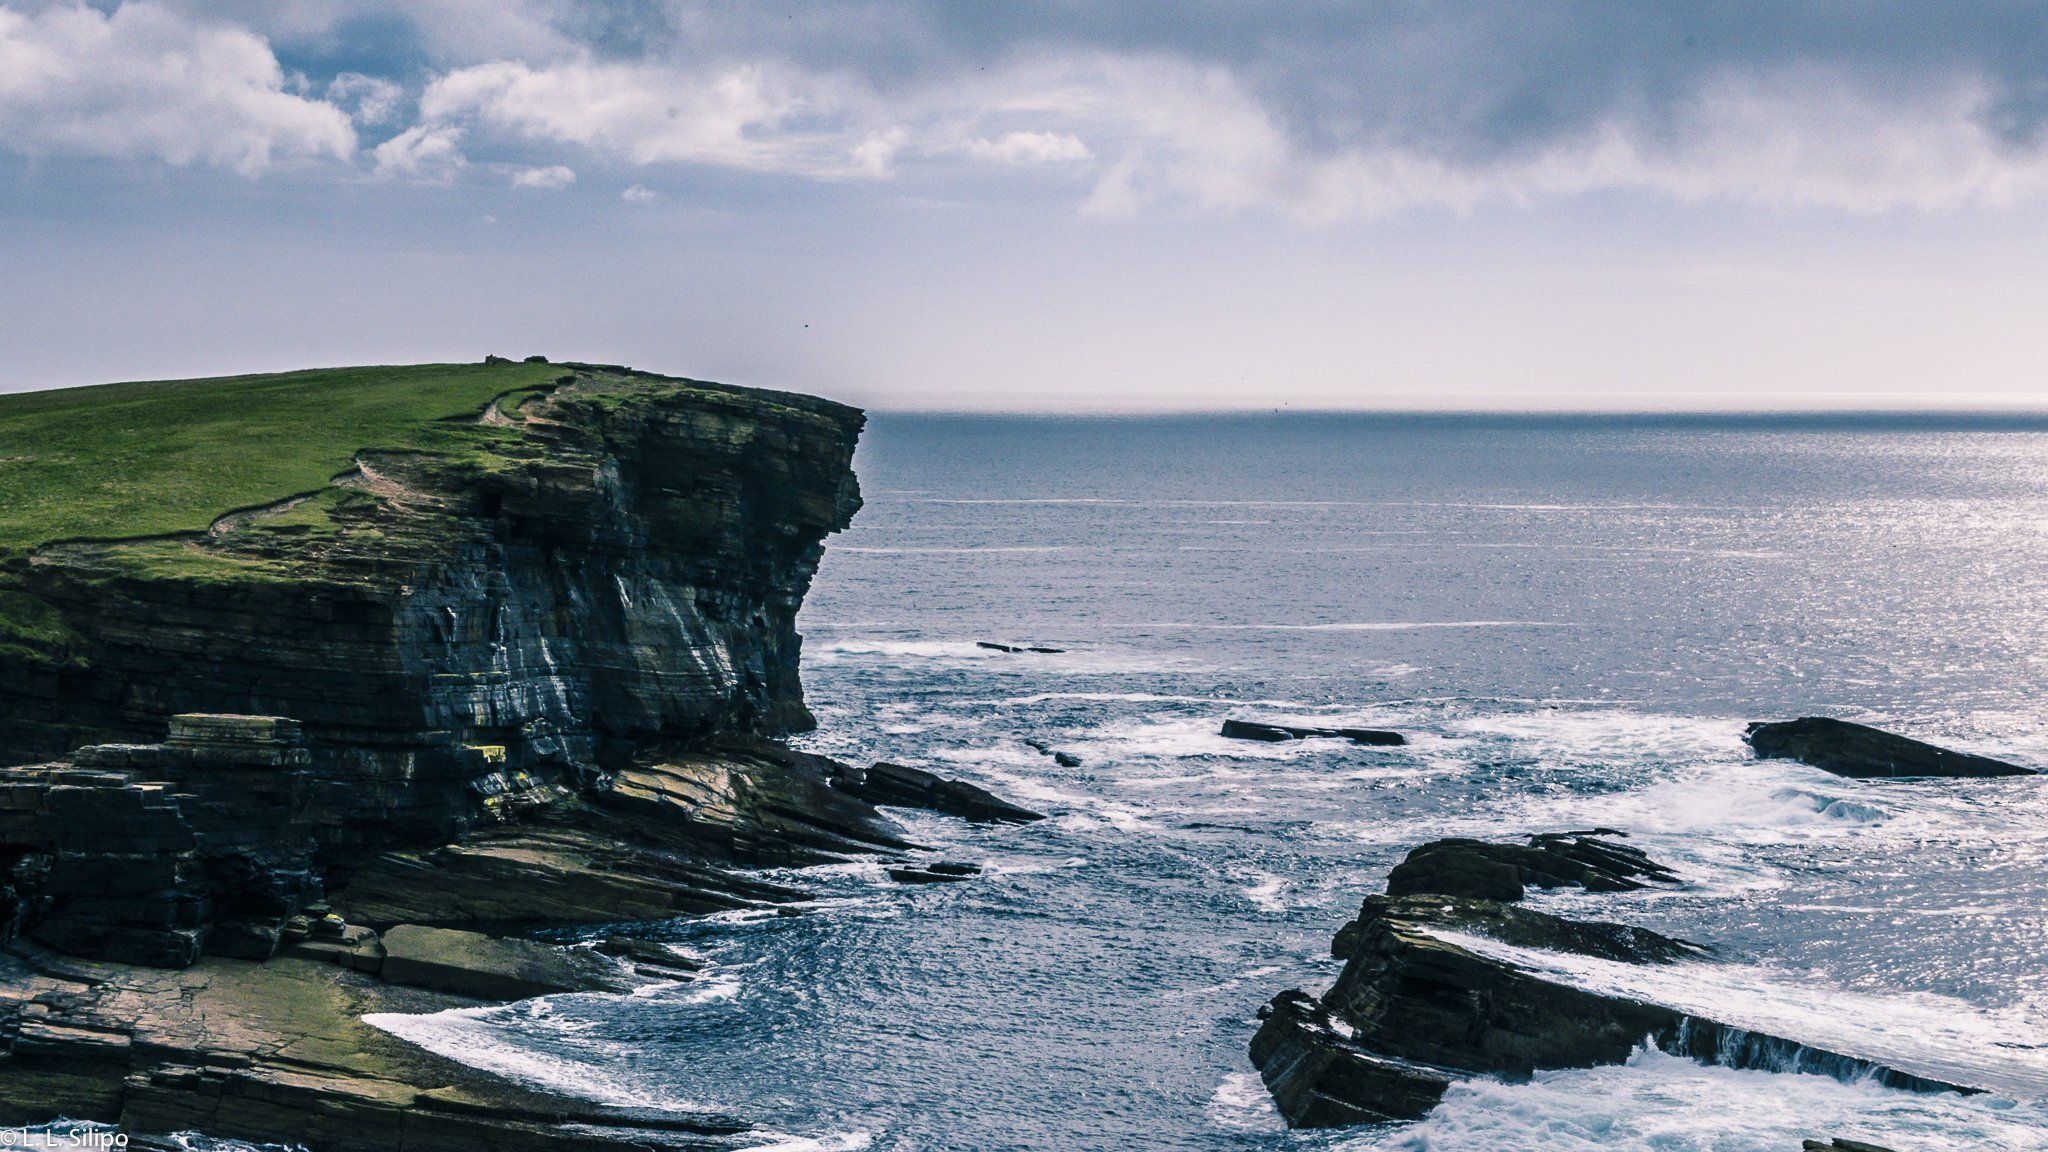 ardnamurchan, atlantic, beautiful, blue, britain, coast, coastal, dark, great, island, isle, landscape, mainland, nature, ocean, outdoor, rocky, scotland, sea, shetland, sky, travel, uk, united